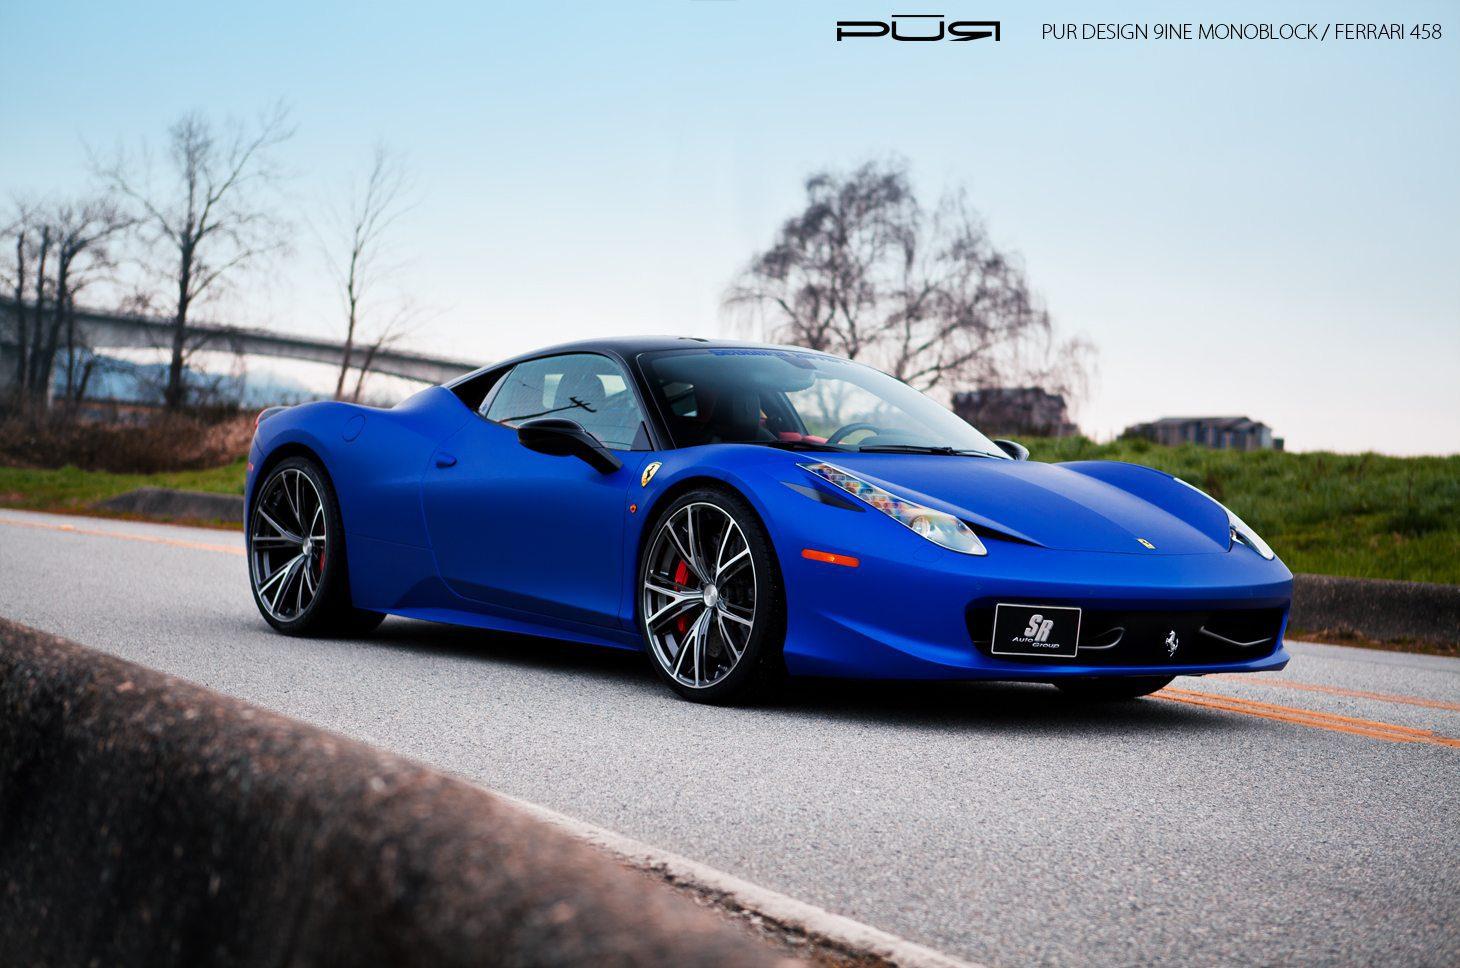 matte blue ferrari 458 italia with pur 9ine monoblock wheels - Ferrari 458 Blue Wallpaper